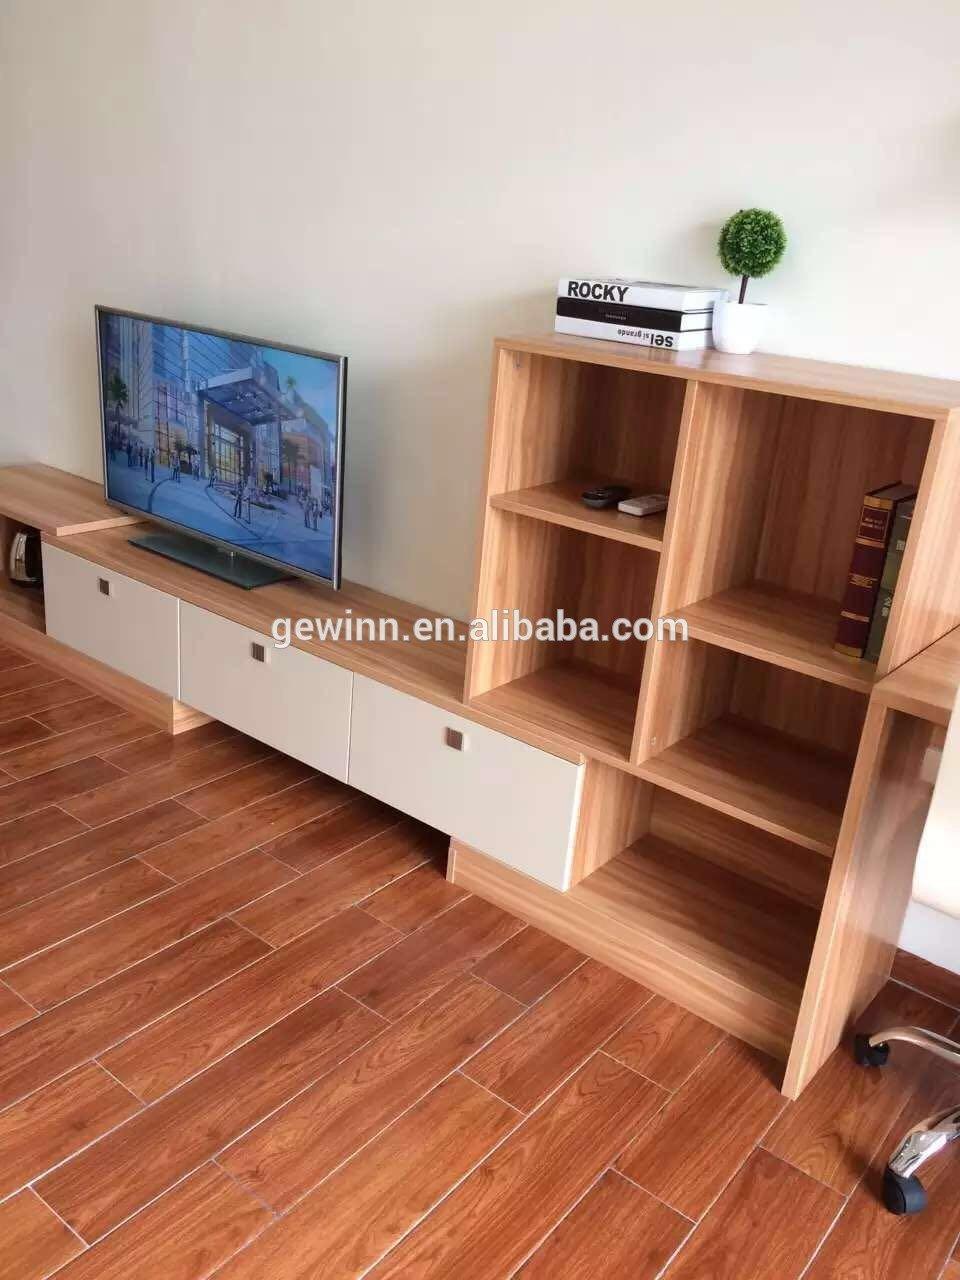 Gewinn cheap woodworking cnc machine best supplier for sale-11